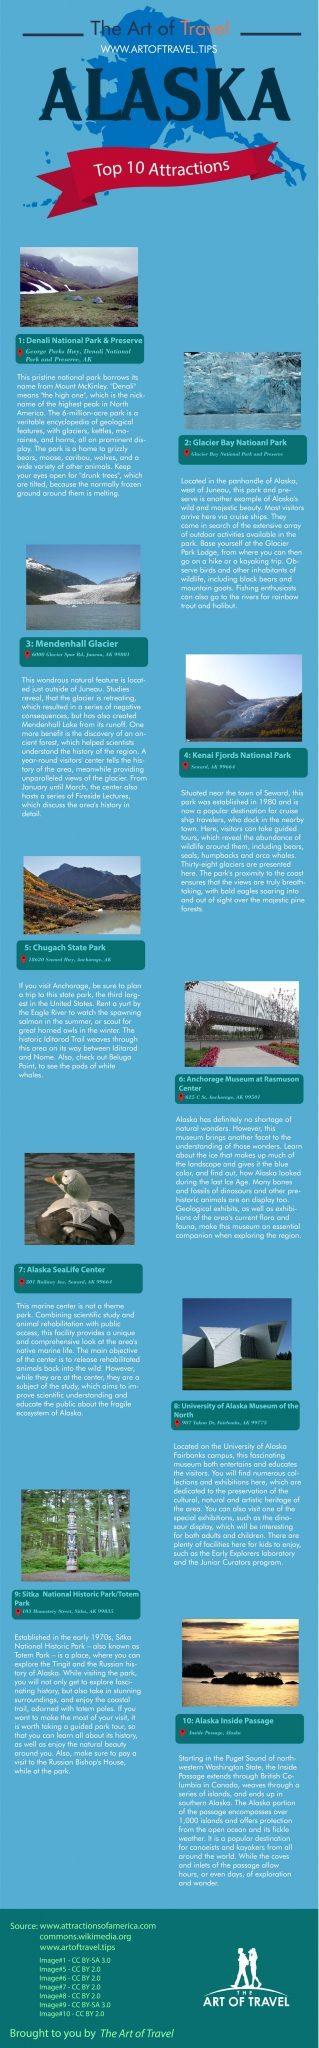 Alaska_Infographic